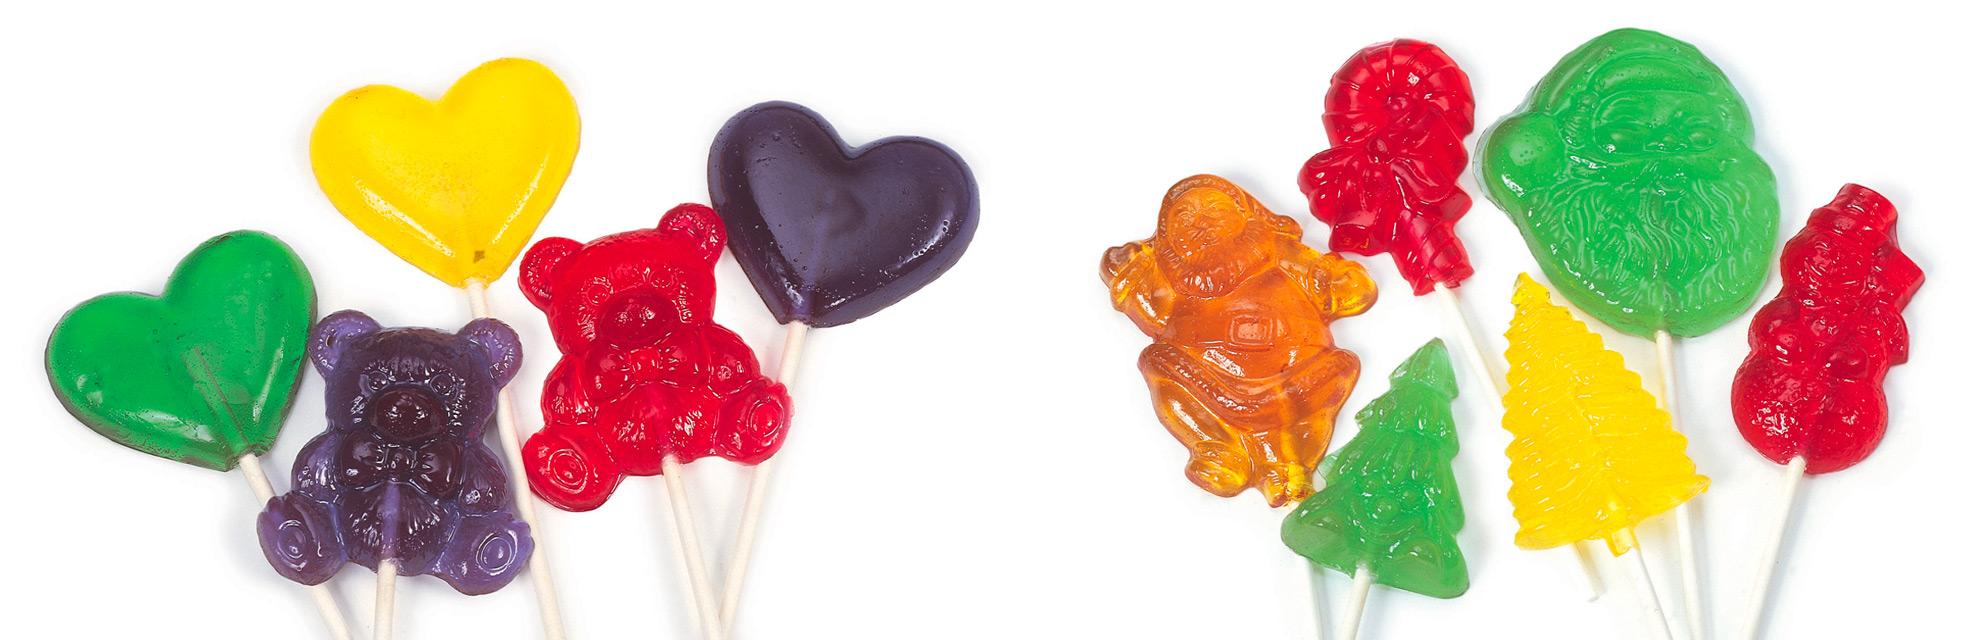 Hard Candy Kits And Mixes LorAnn Oils